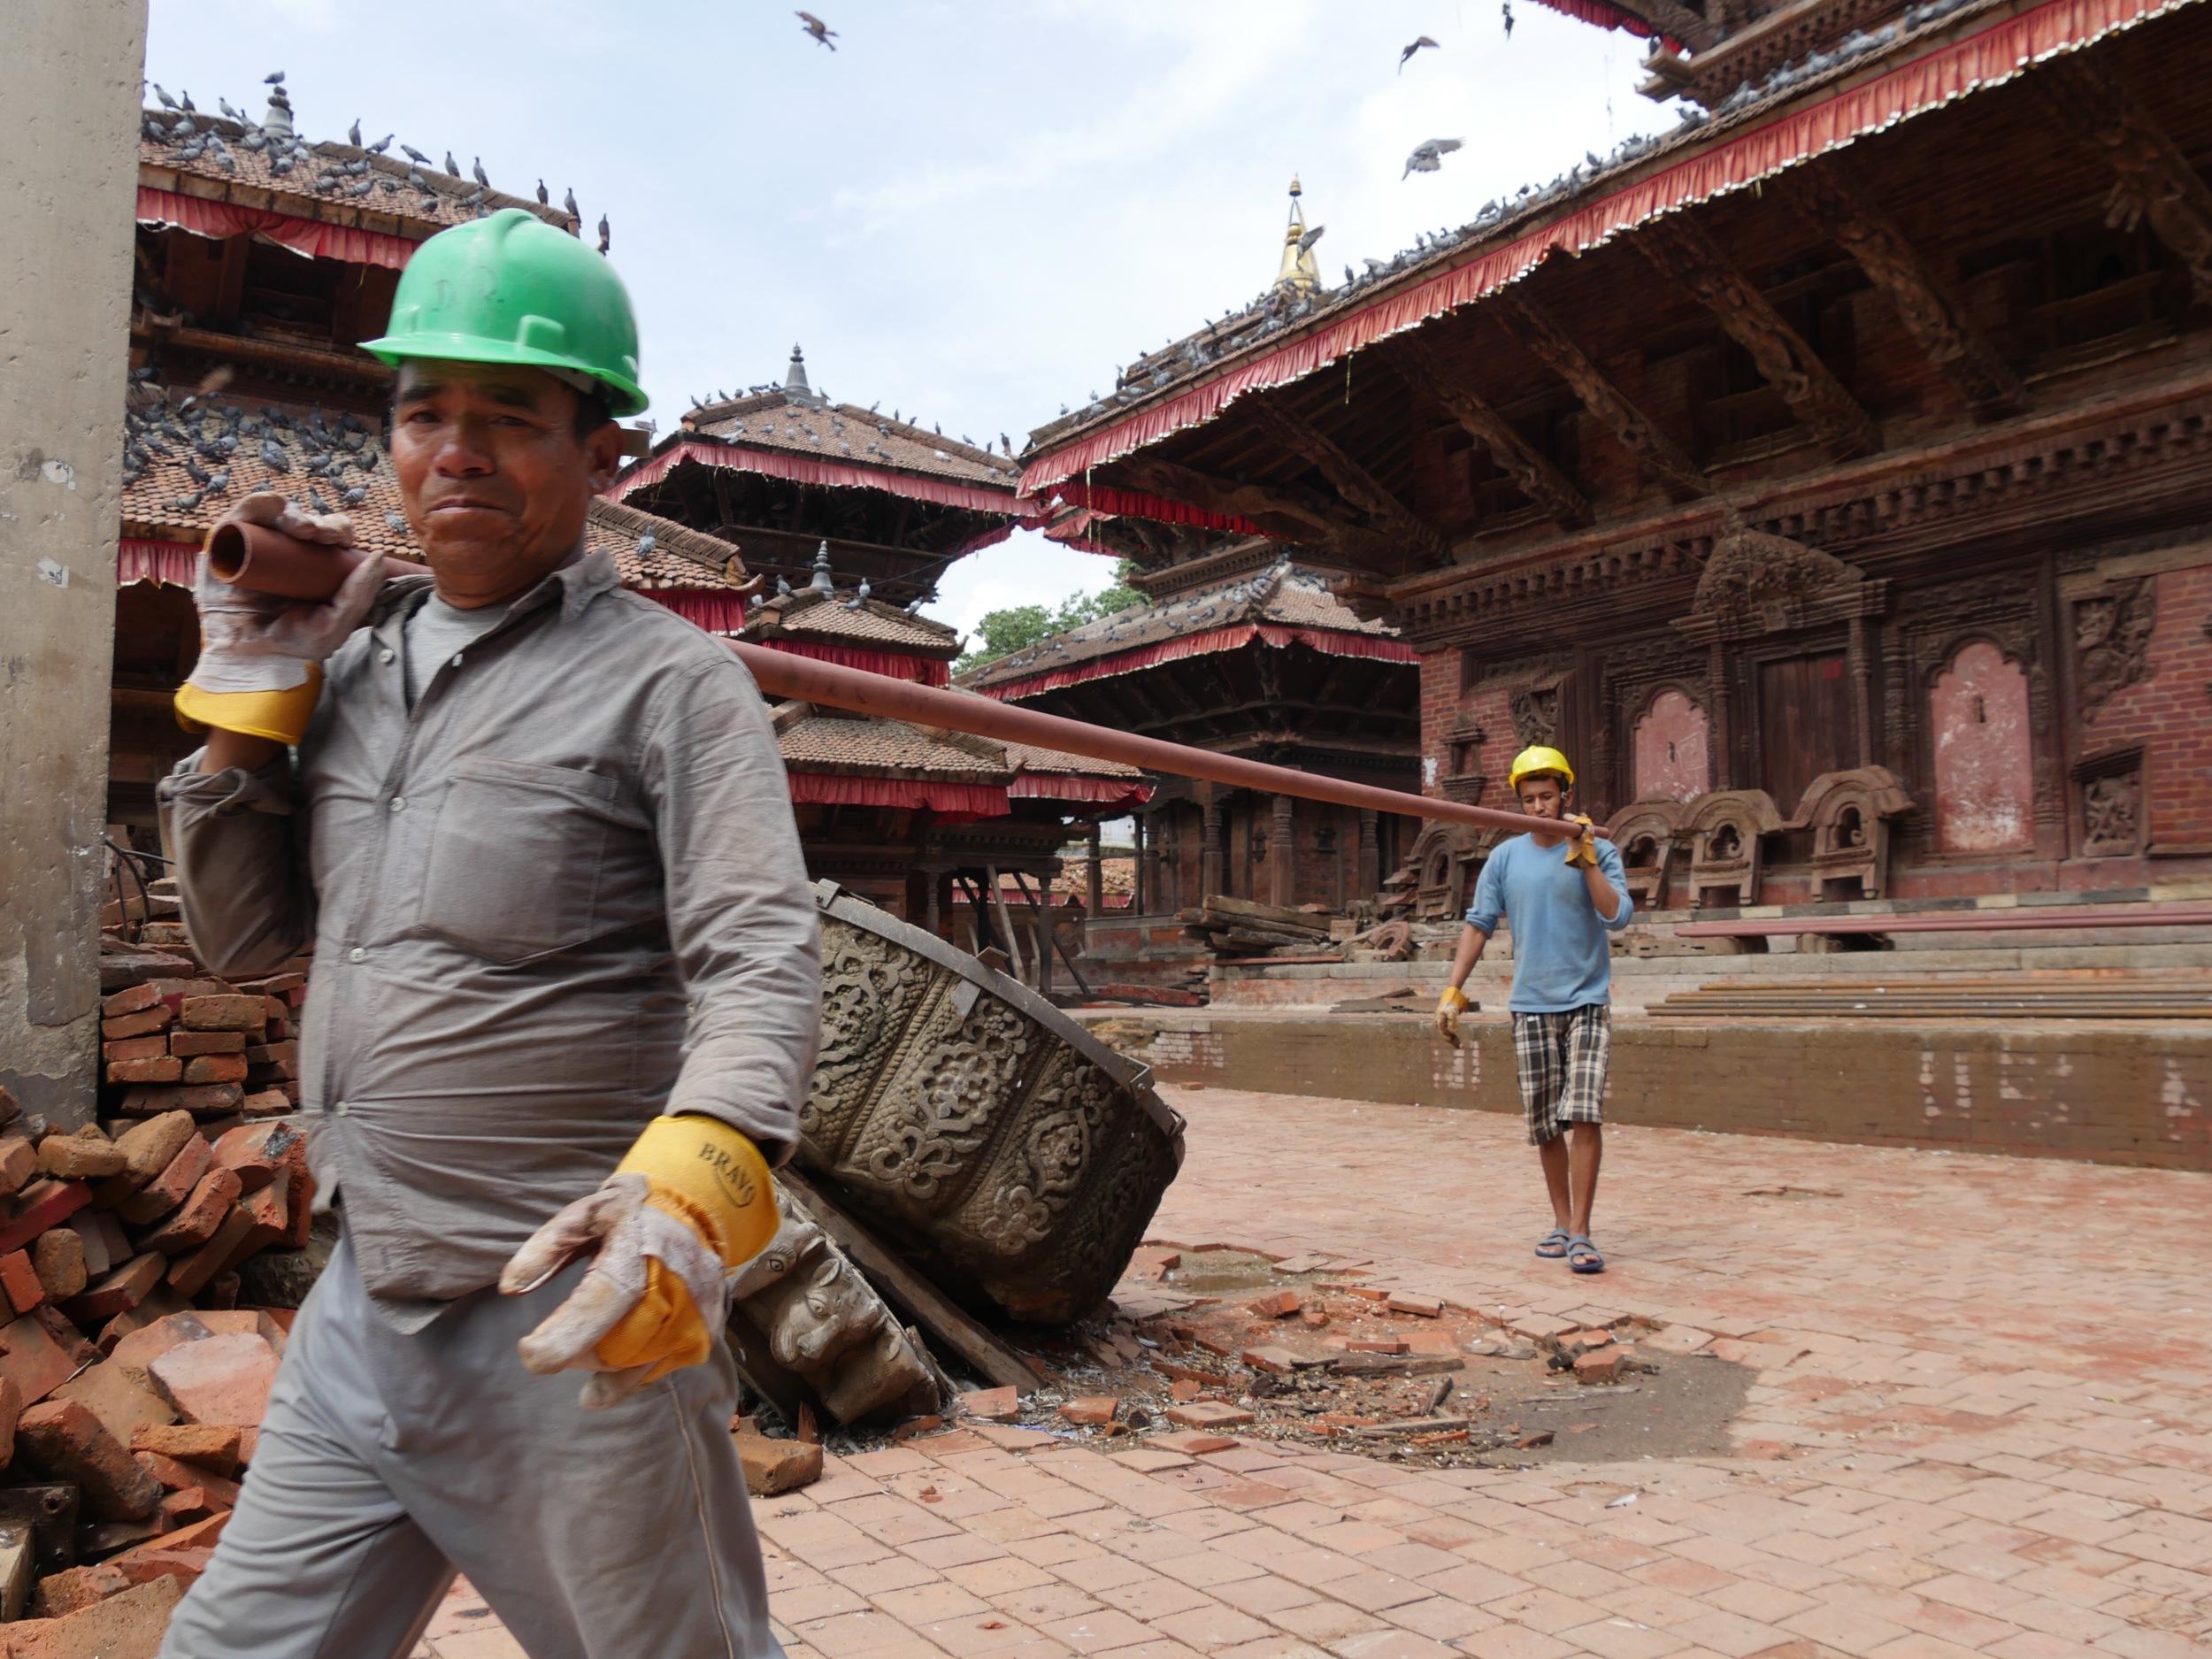 Workmen securing structures in Durbar Square